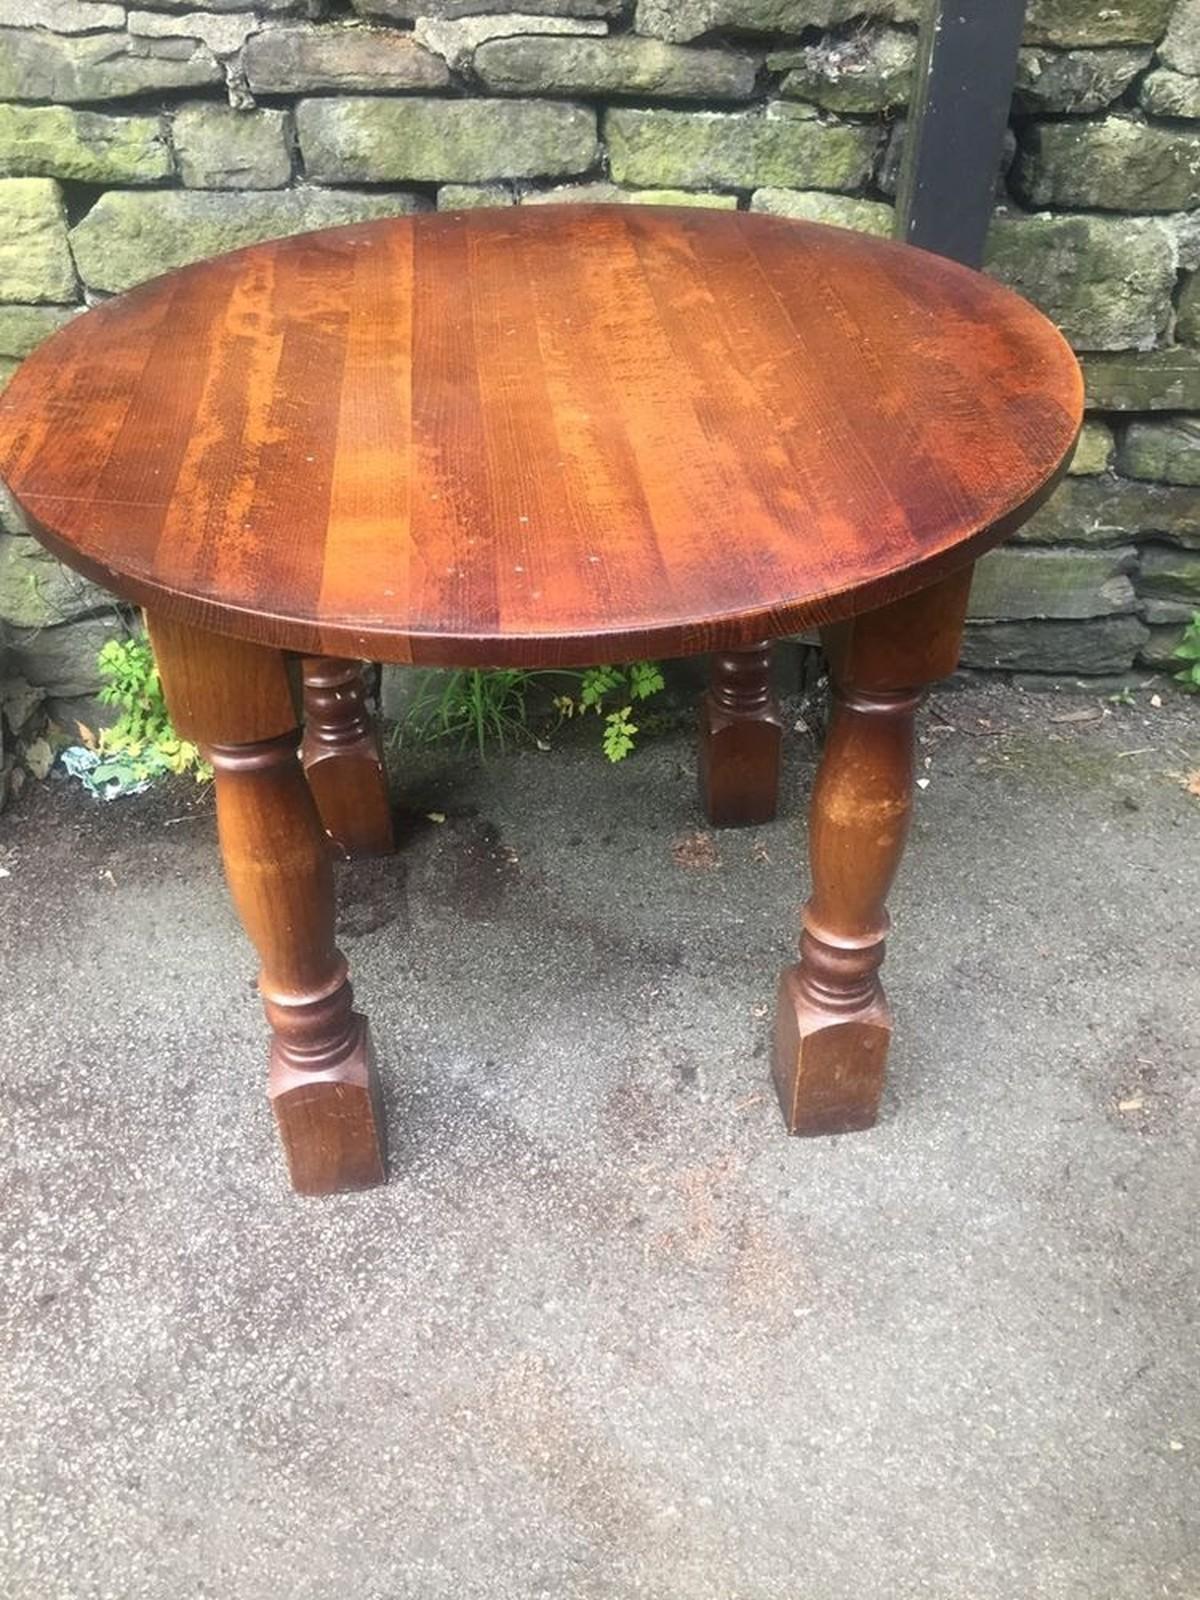 secondhand pub equipment pub tables round dining tables oldham lancashire. Black Bedroom Furniture Sets. Home Design Ideas